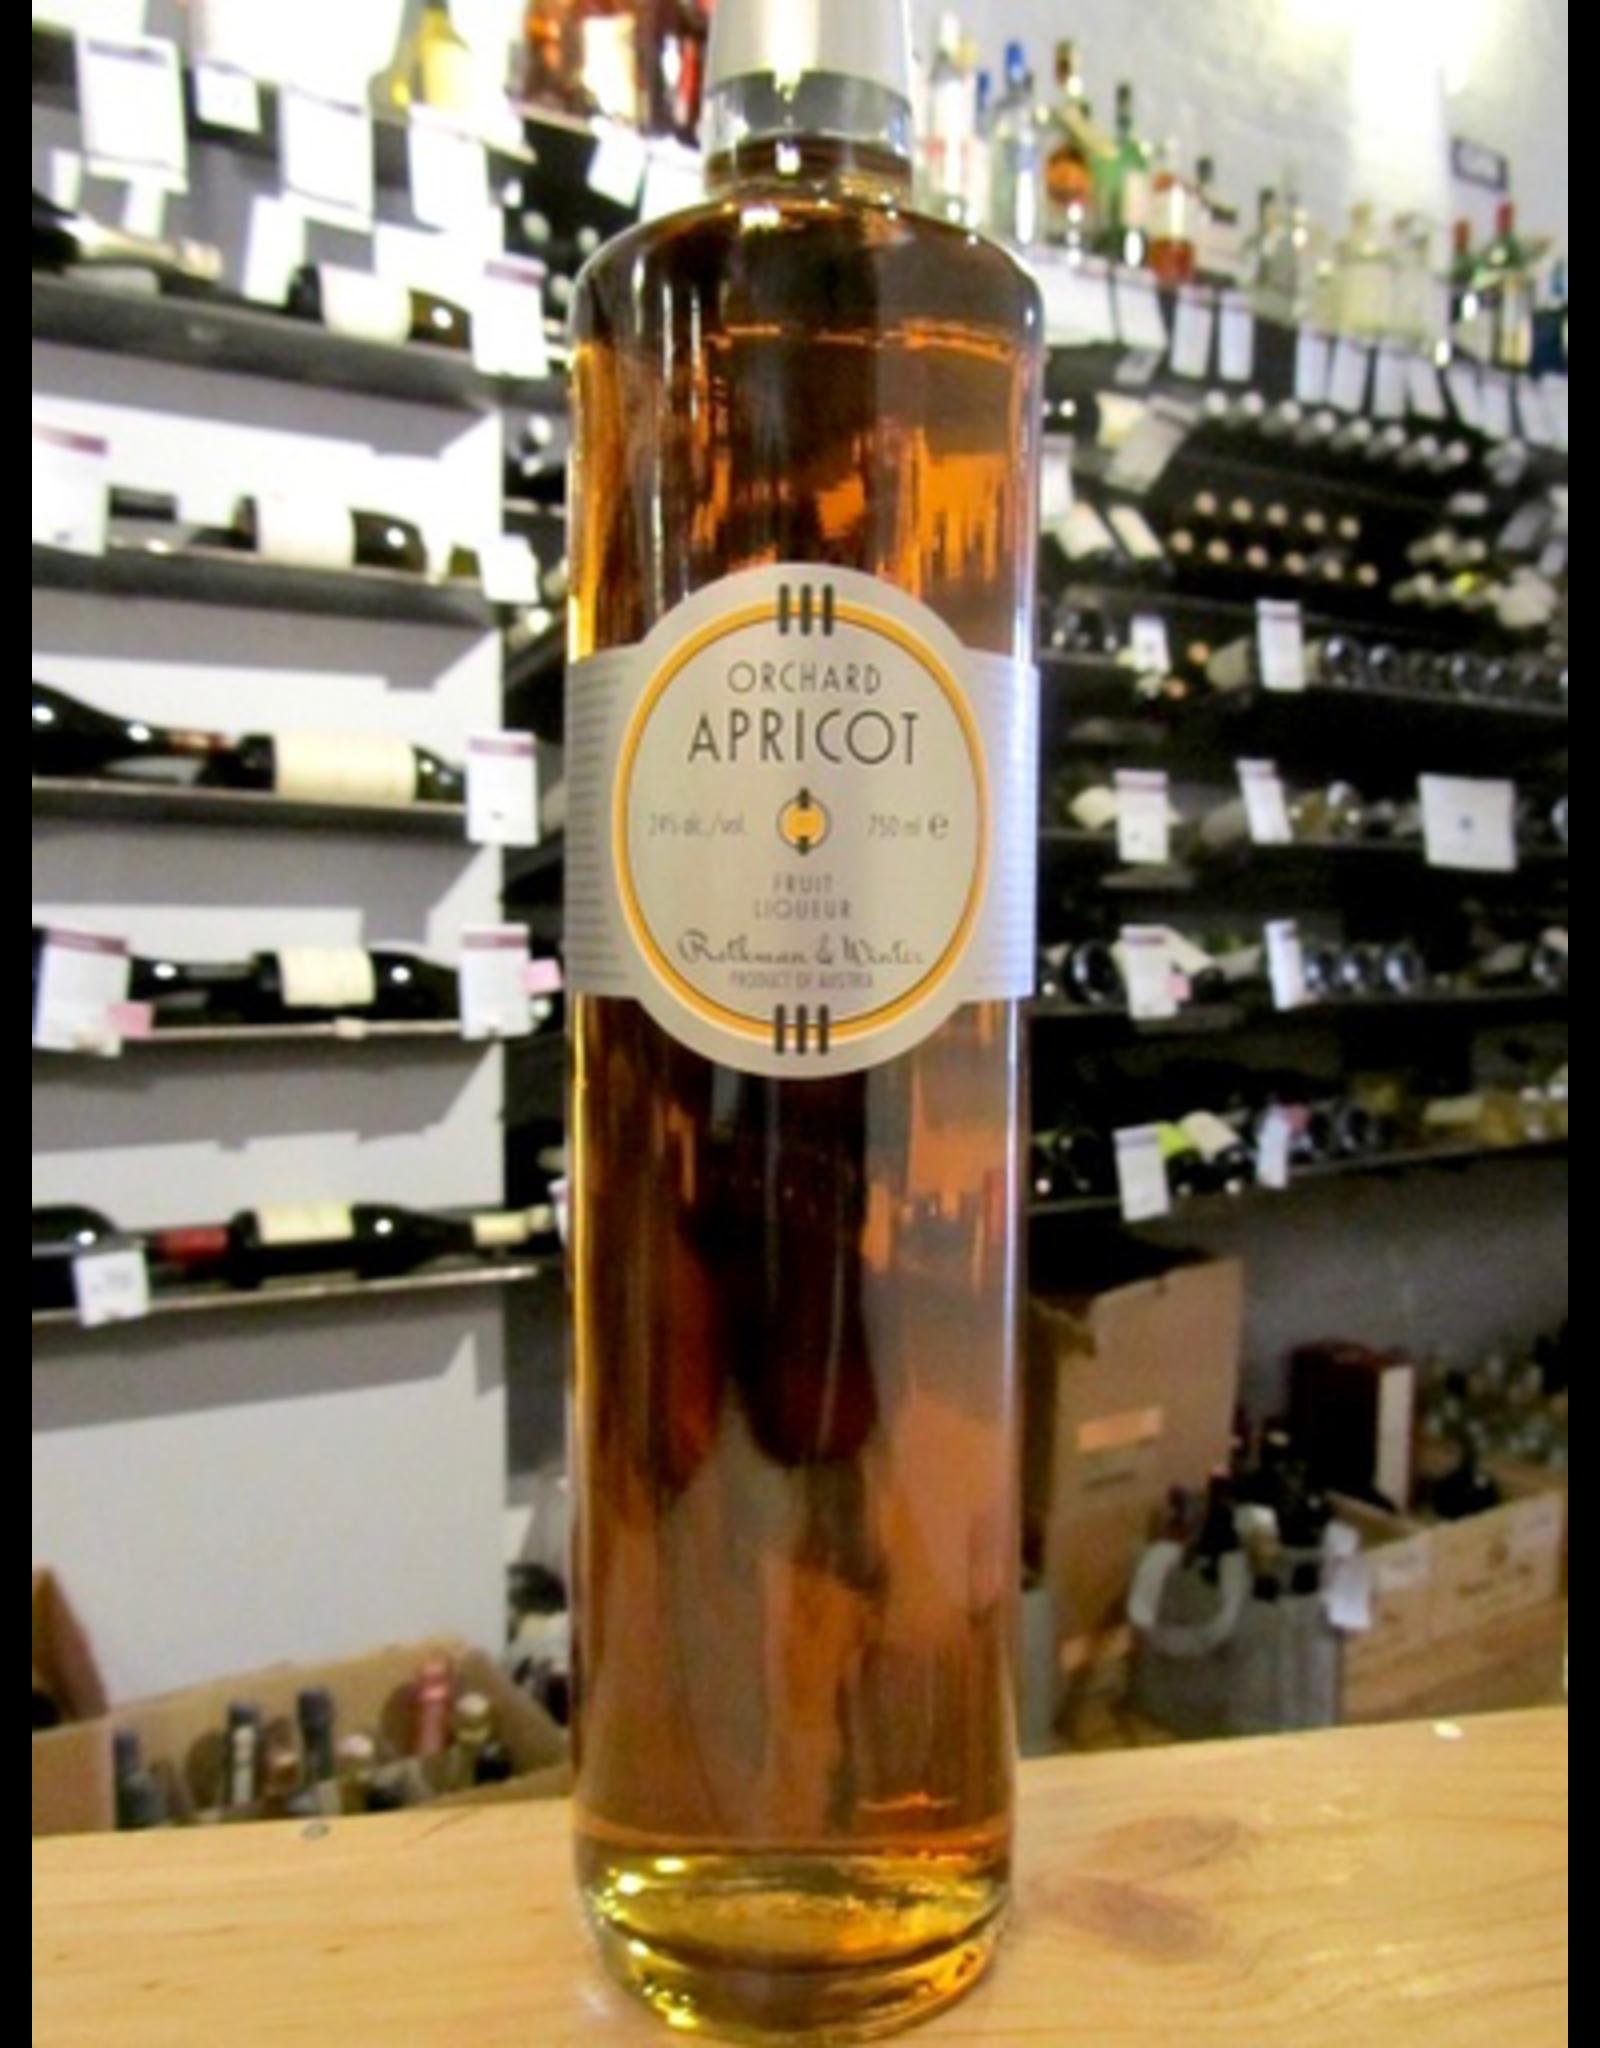 Rothman & Winter Orchard Apricot Liqueur - Austria (750ml)